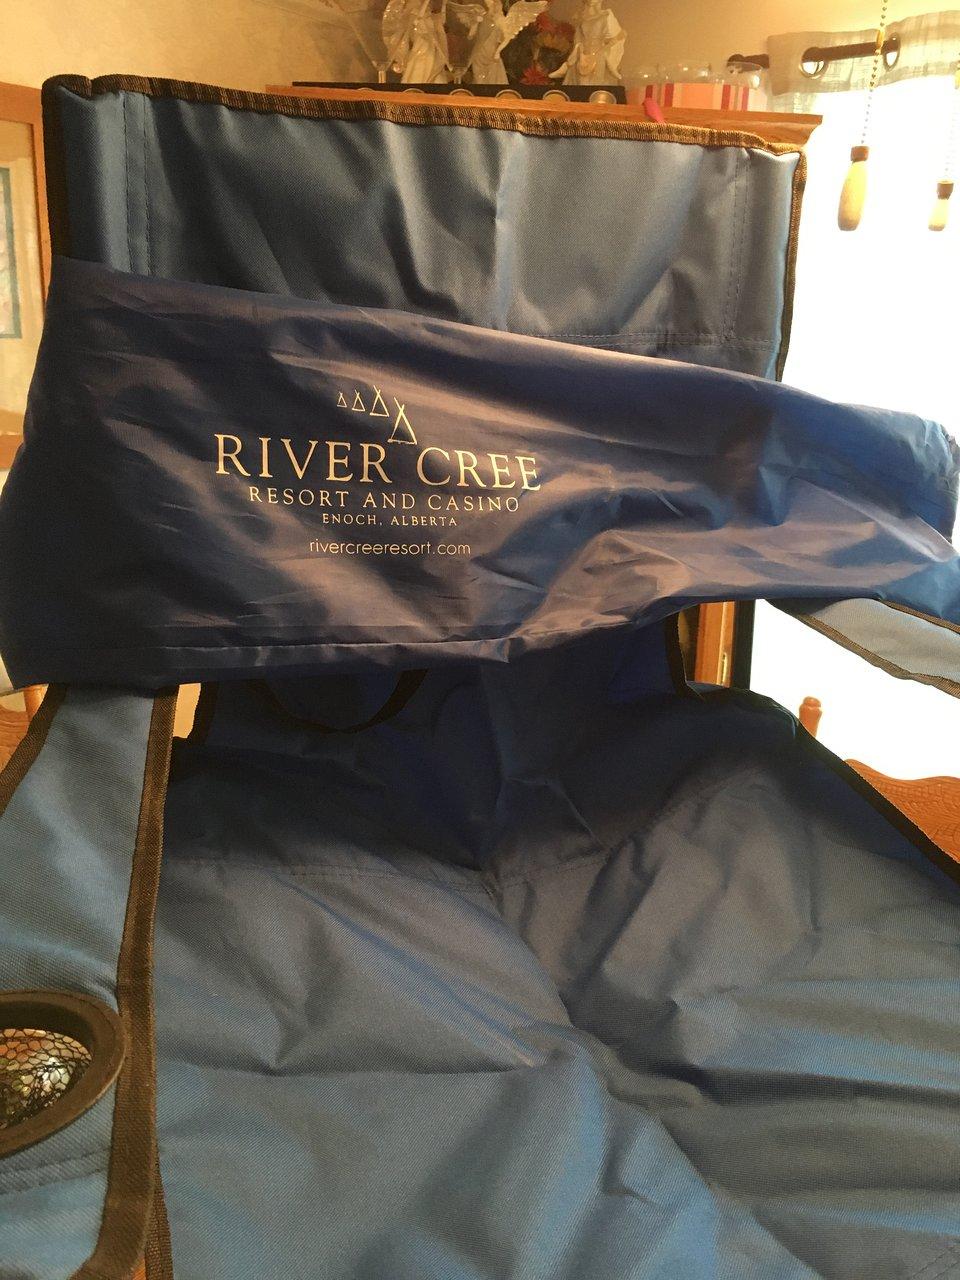 river cree resort and casino 94 1 1 1 updated 2019 prices rh tripadvisor com